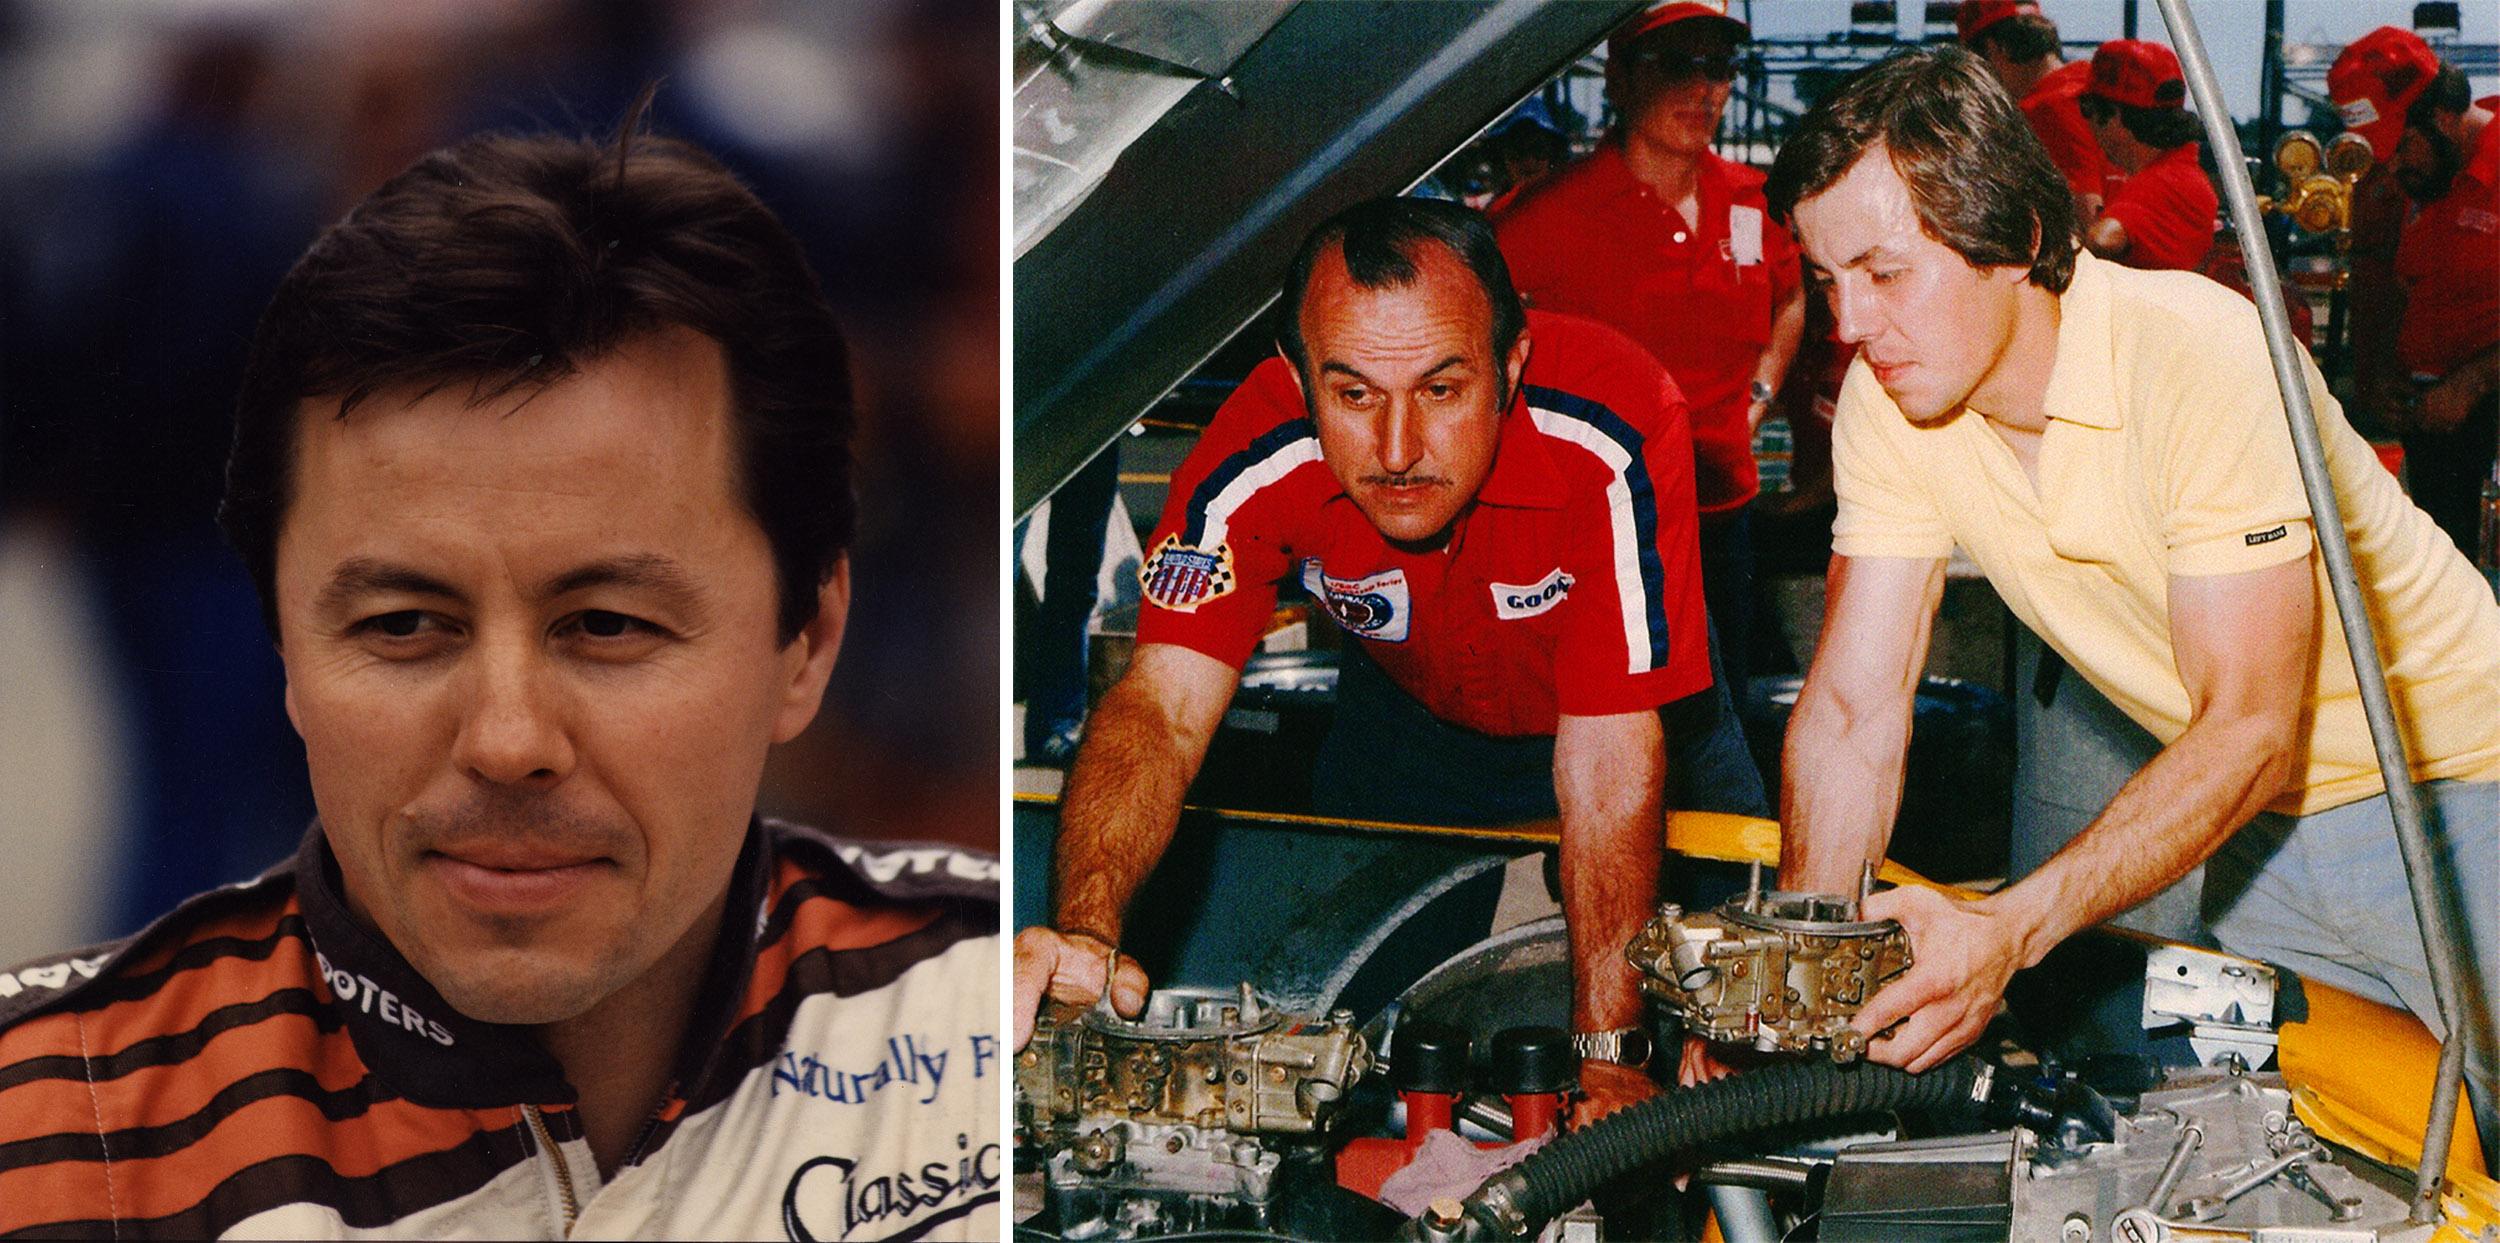 Alan Kulwicki (left); Alan and Gerald Kulwicki look over the engine in one of Alan's cars.